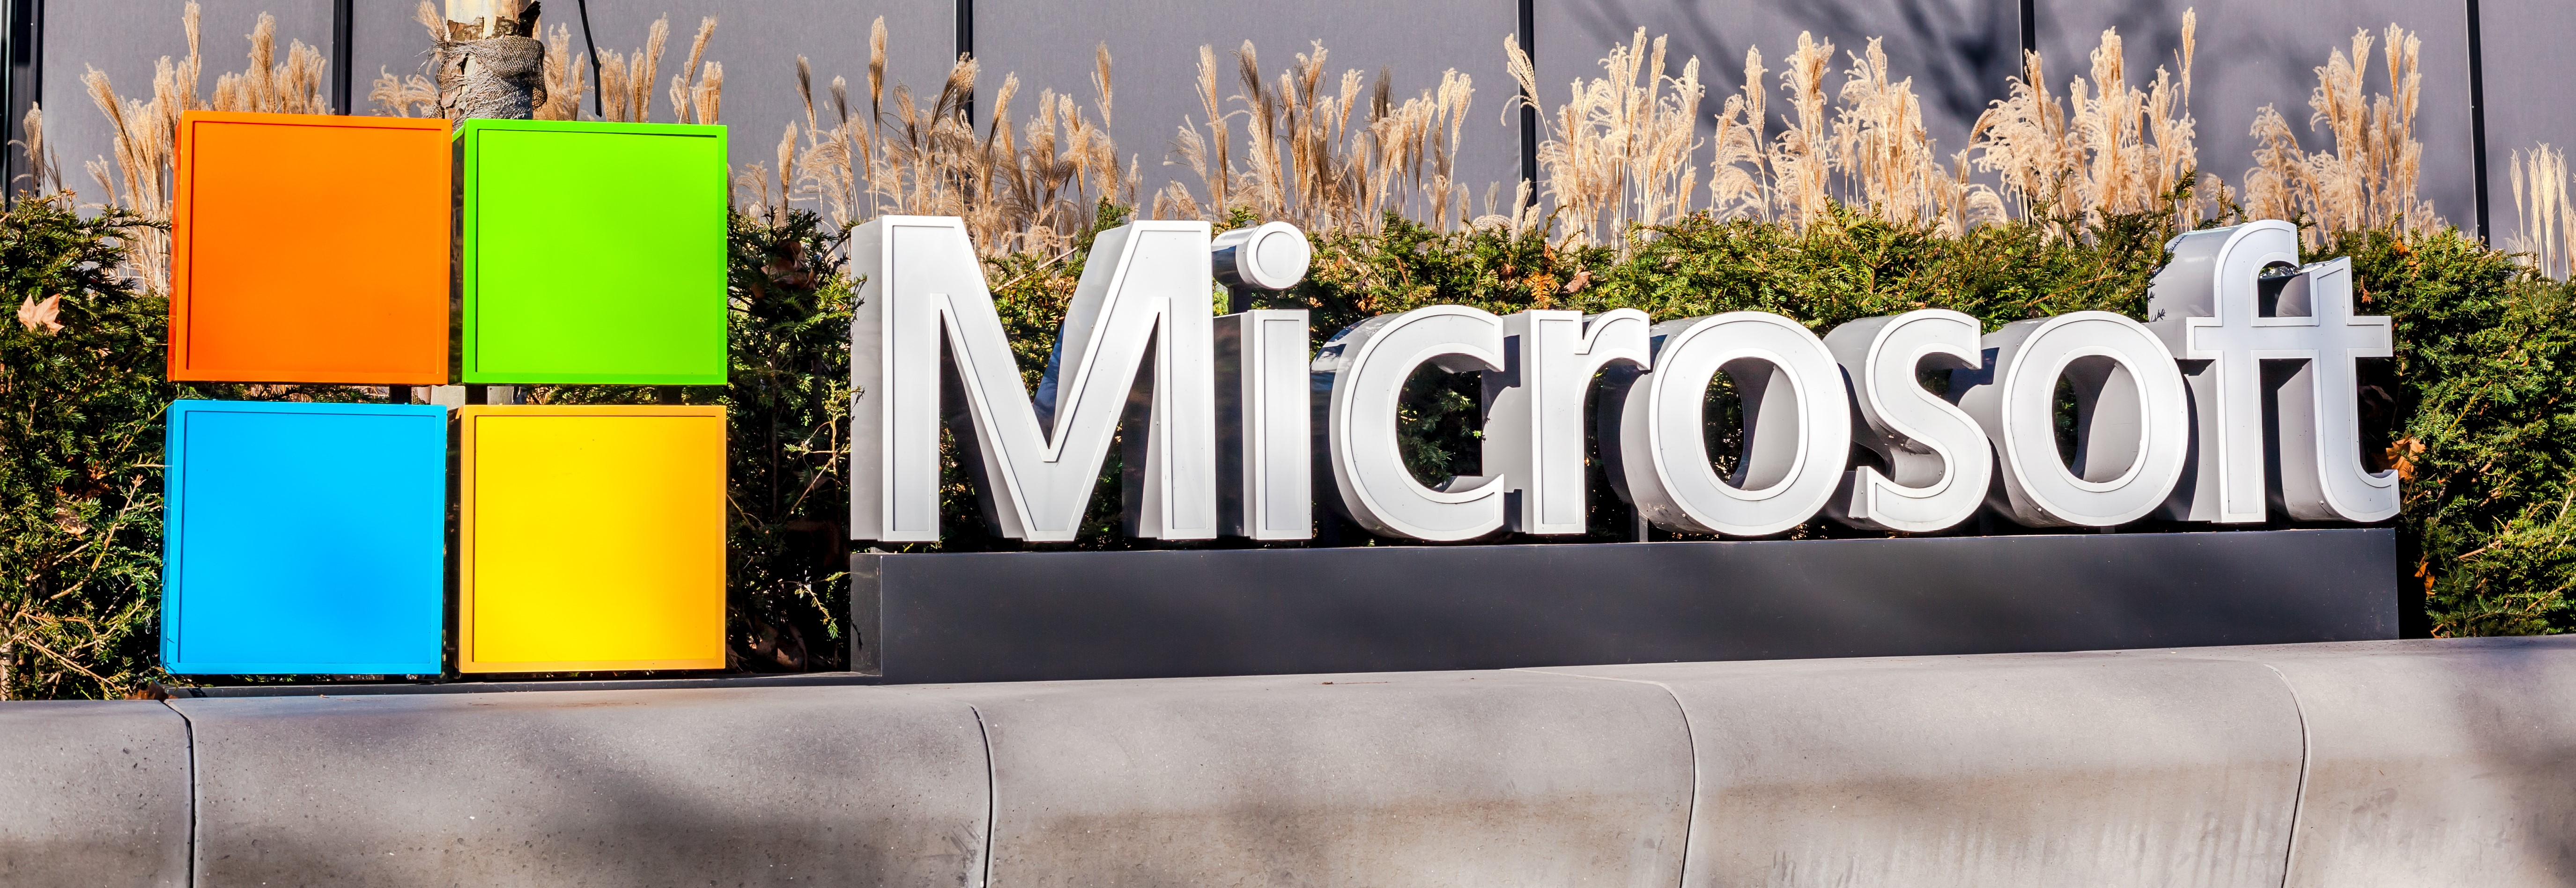 Microsoft's market cap hits US$1 trillion